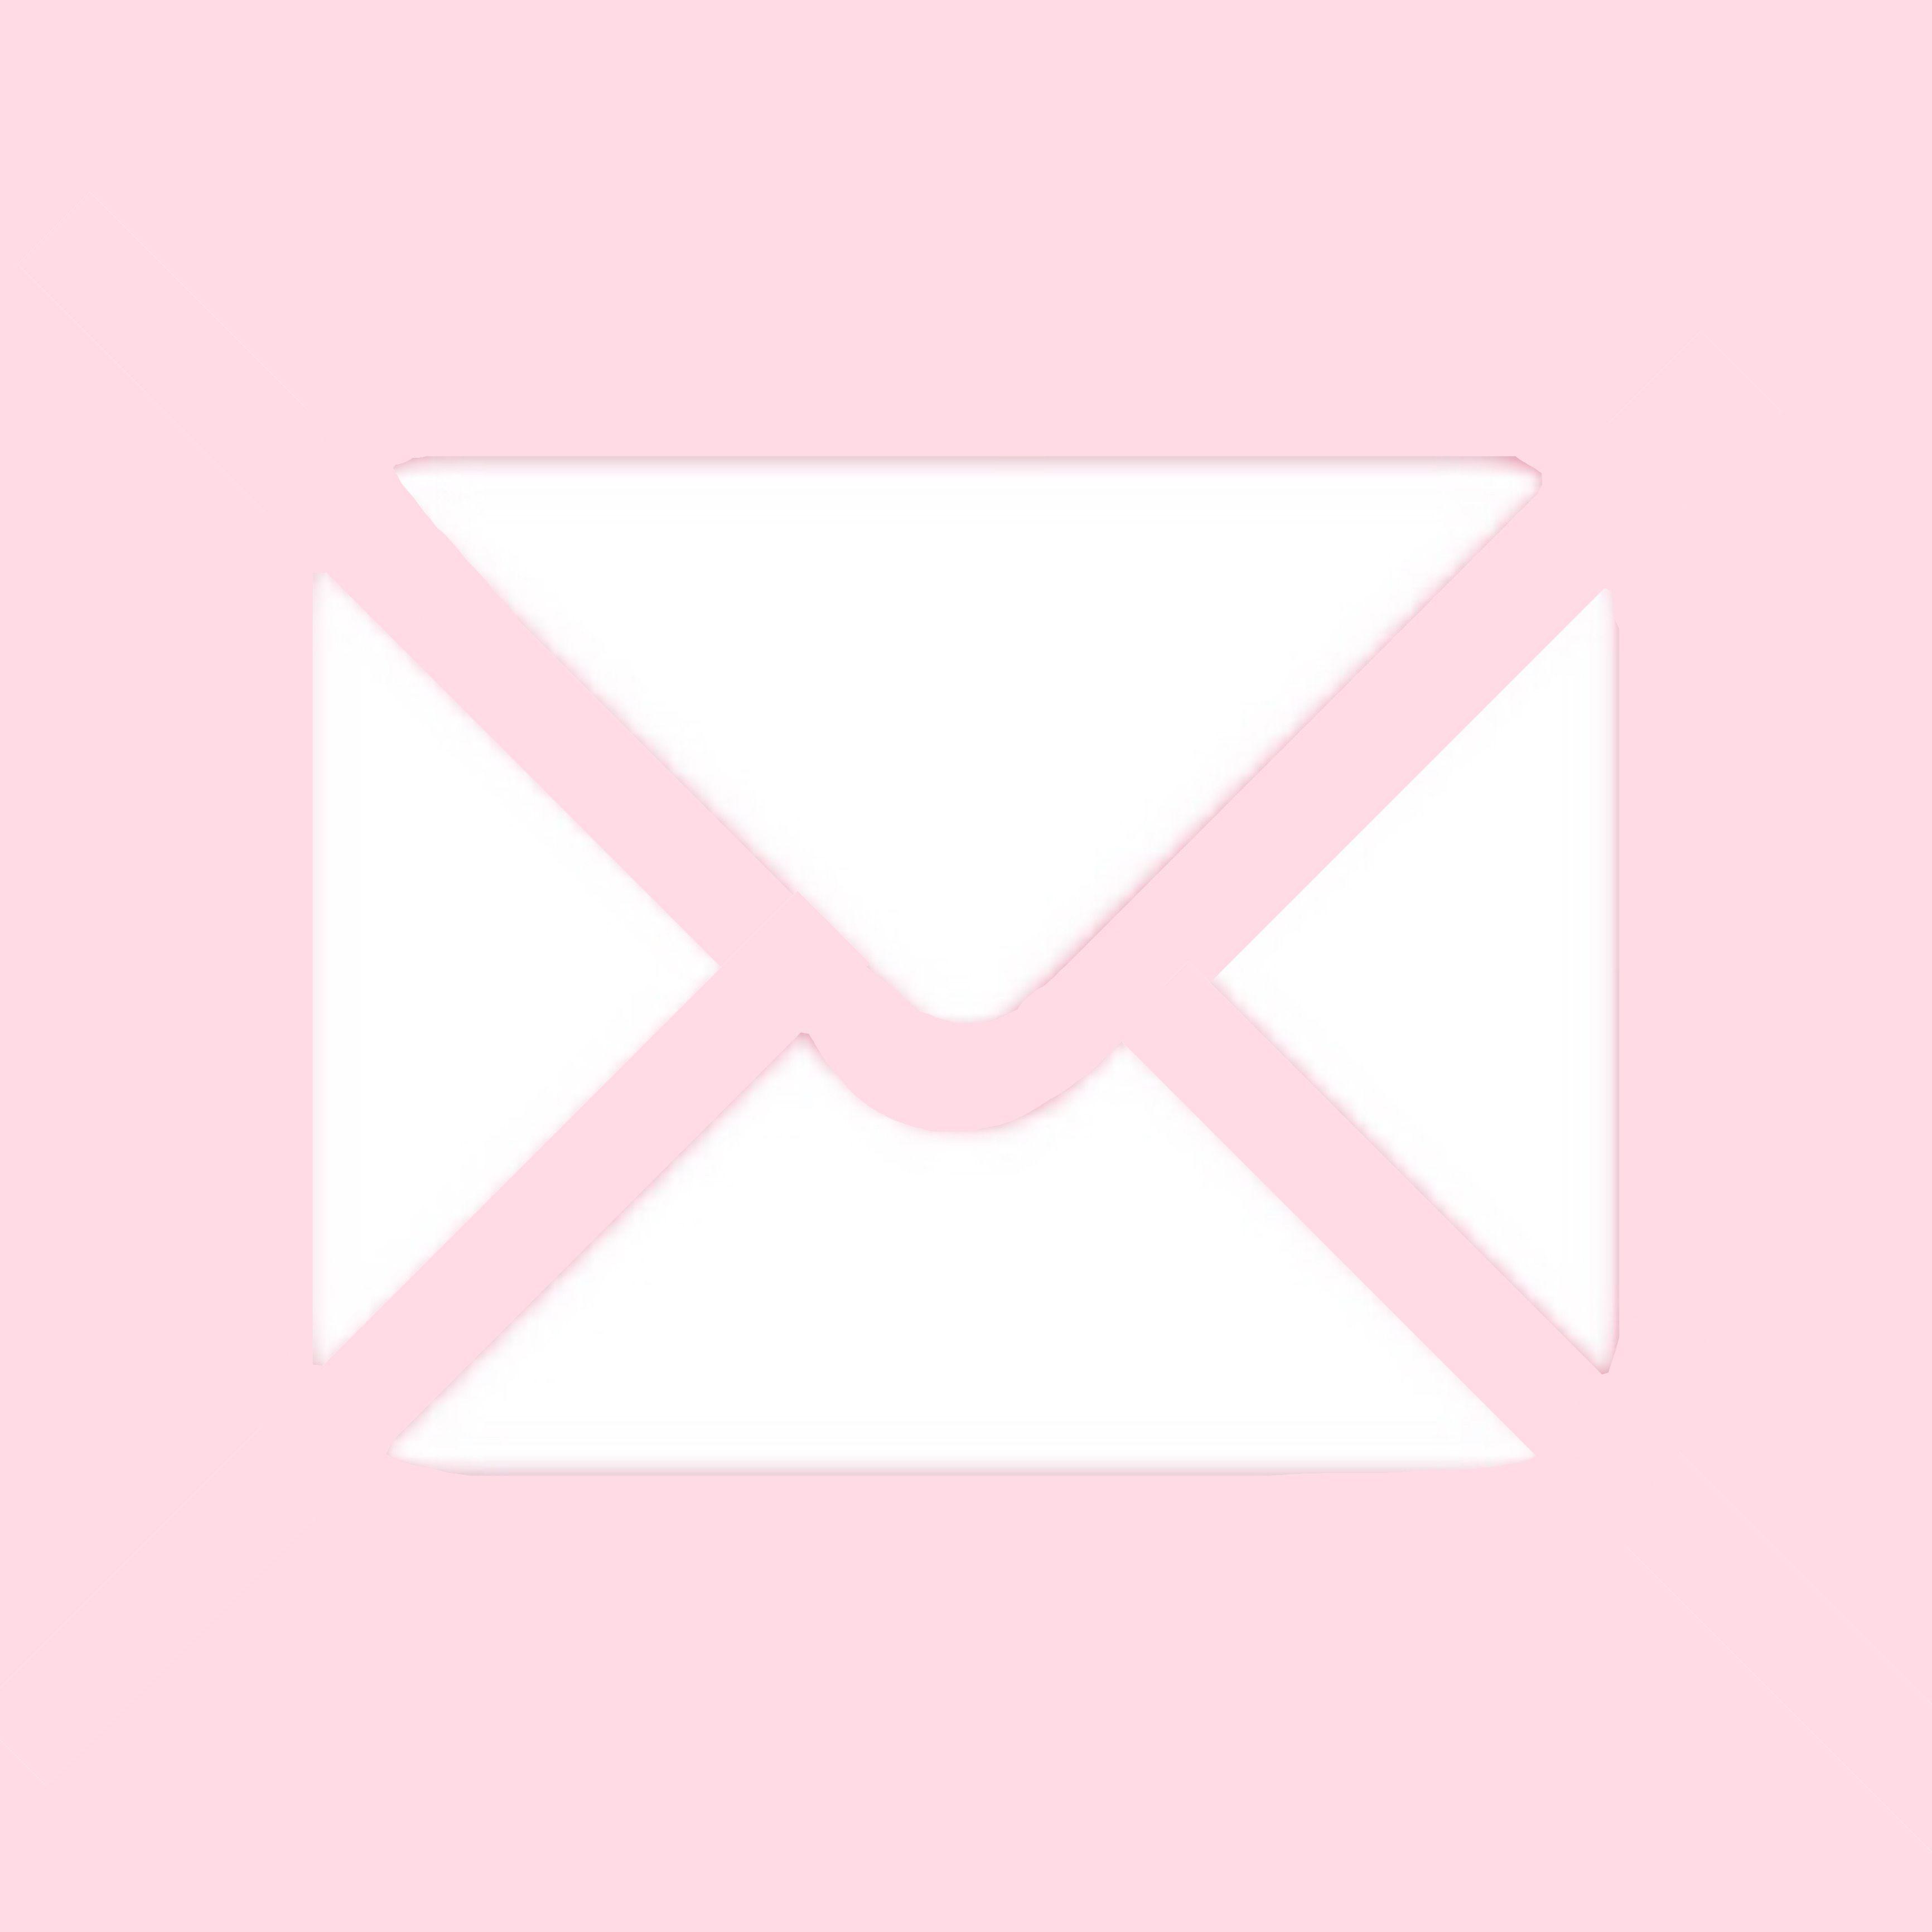 Email App Shortcut Aesthetic Pink Lightpink Pinkaethetic Mail In 2020 Iphone Wallpaper App Purple Wallpaper Iphone Pink Wallpaper Iphone